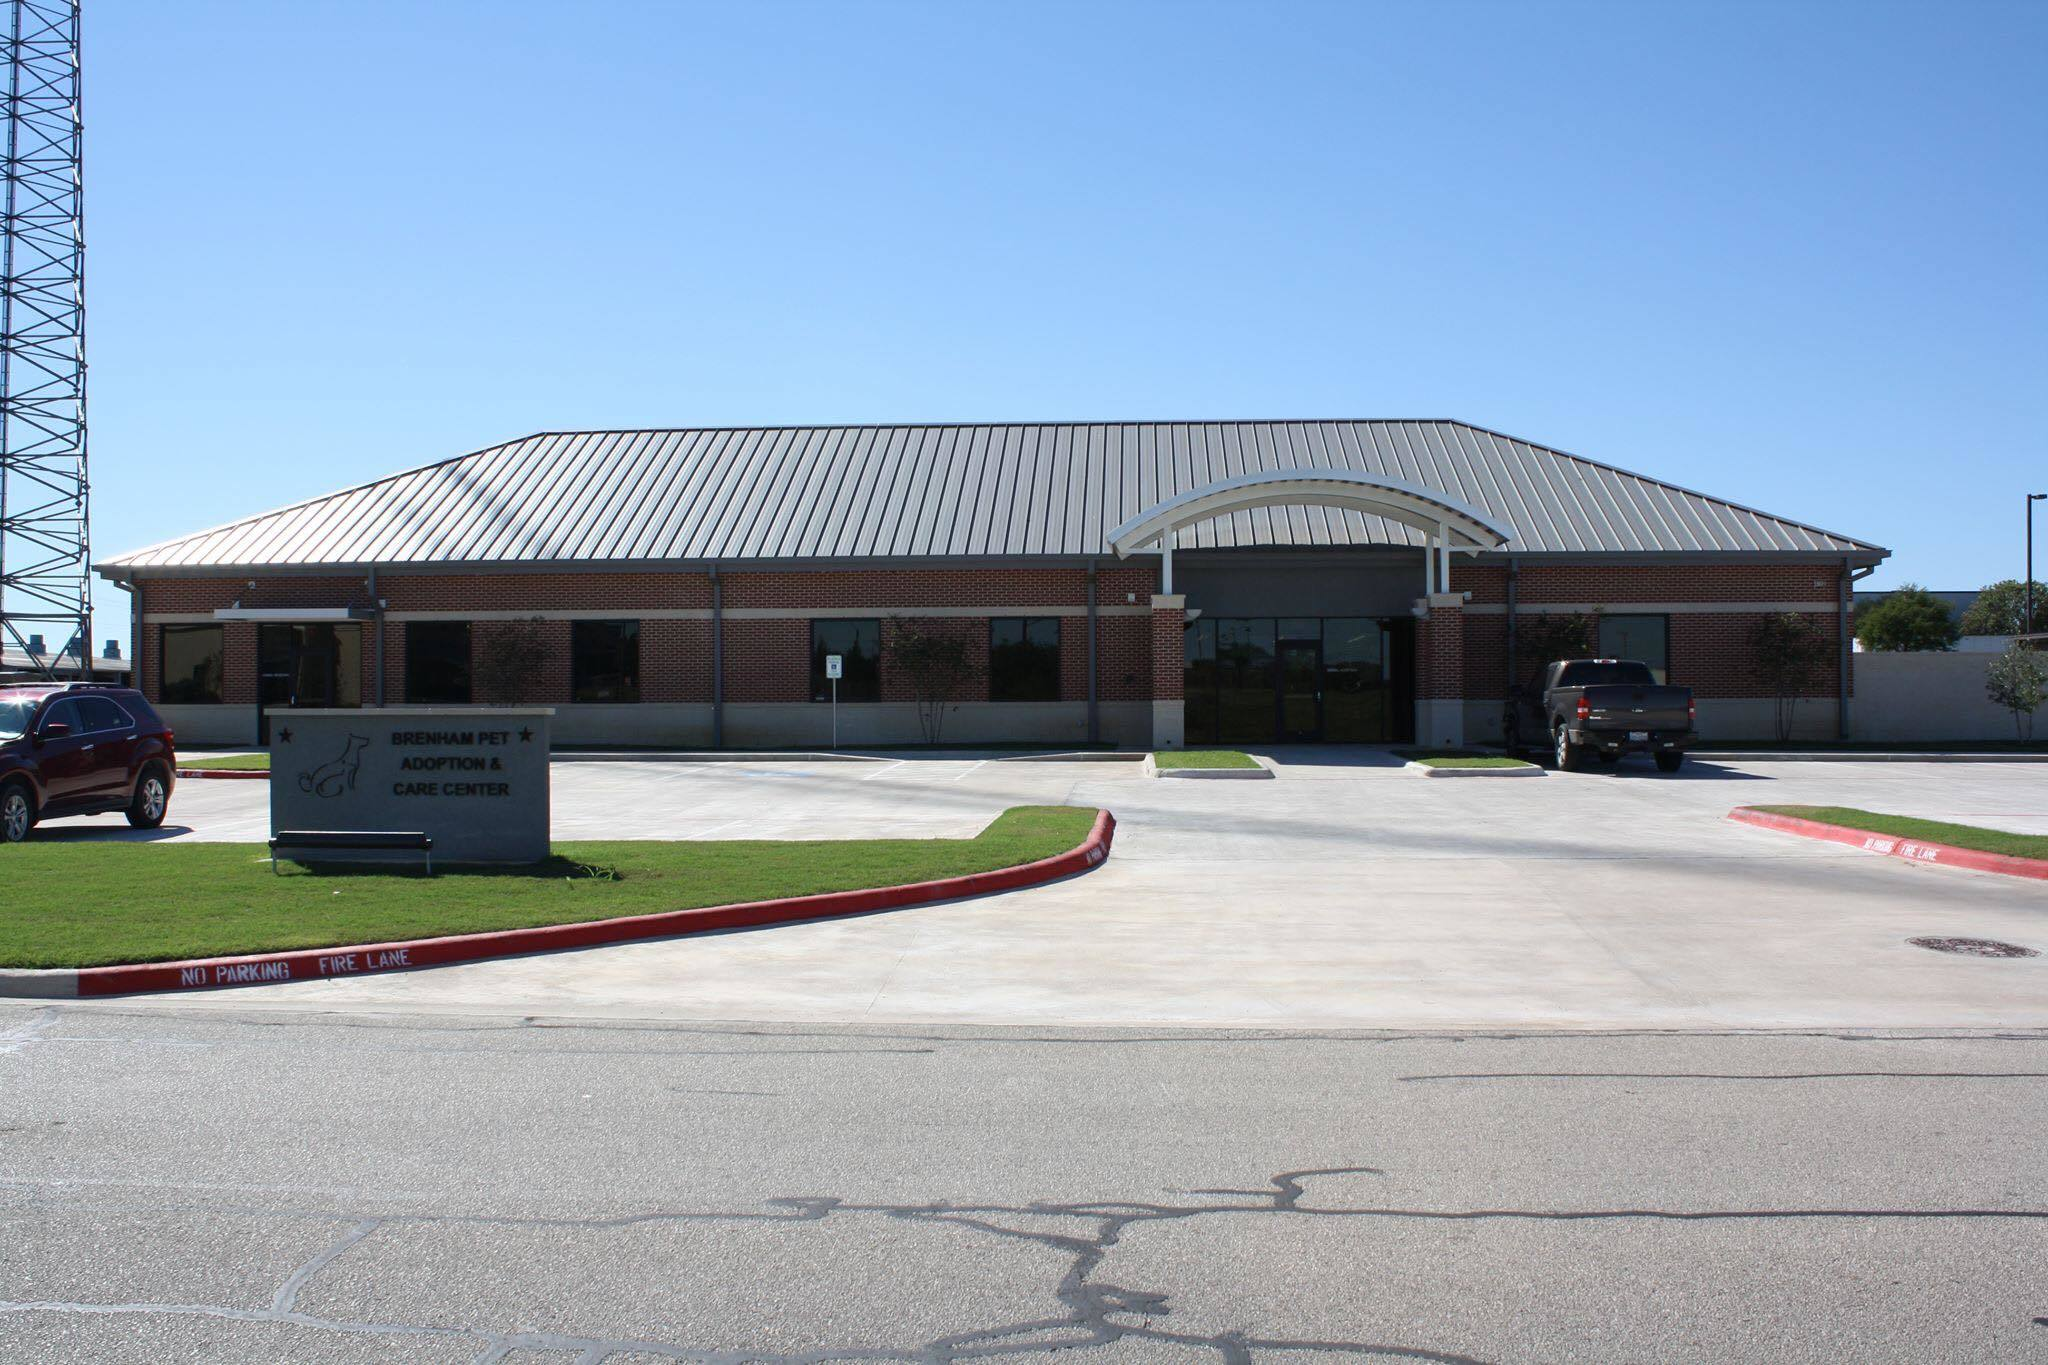 Brenham Humane Services